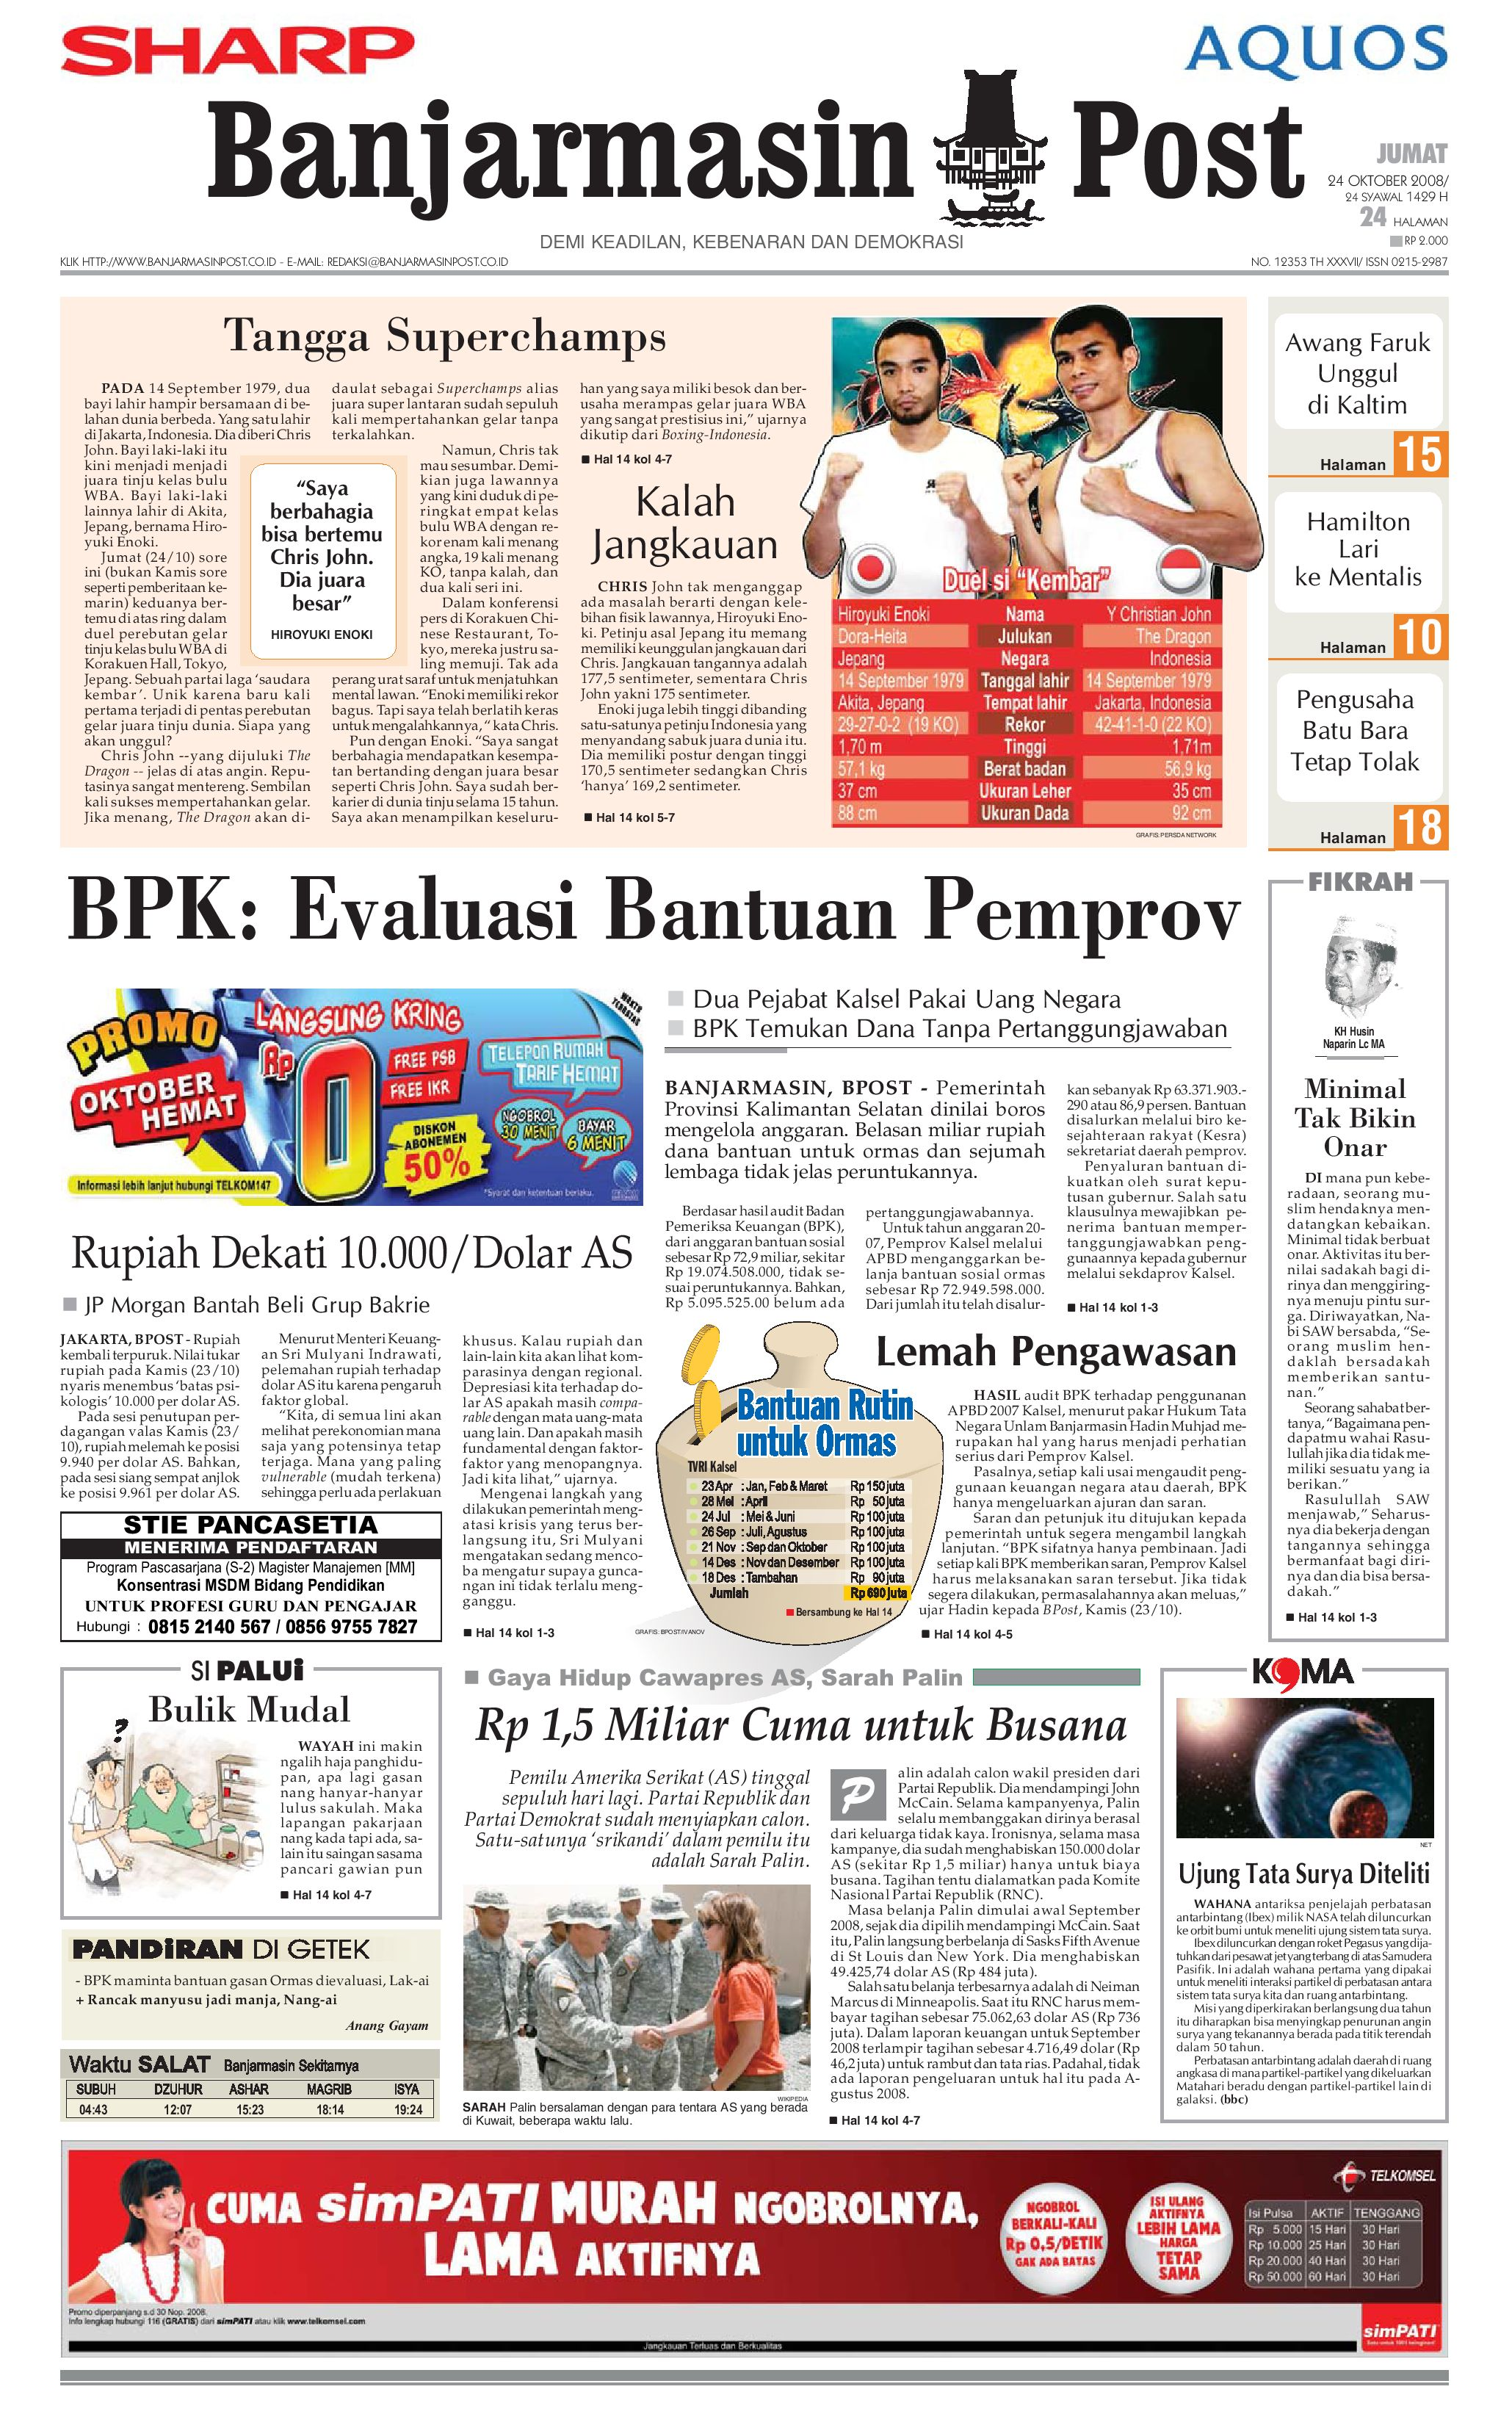 Banjarmasin Post 24 Oktober 2008 By Issuu Fcenter Meja Makan Dt Sienna Dan Dc Danish Jabodetabek